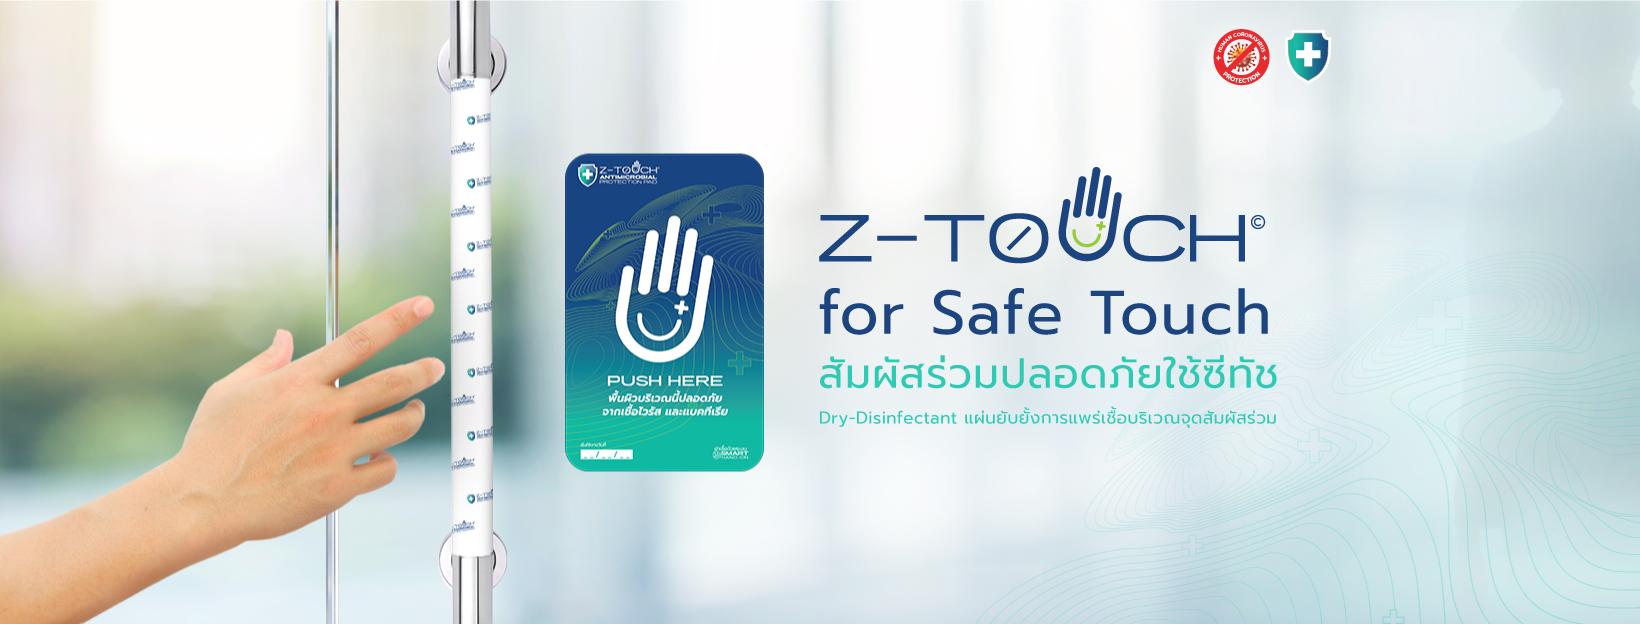 Z-Touch แผ่นกำจัดเชื้อไวรัสและแบคทีเรีย